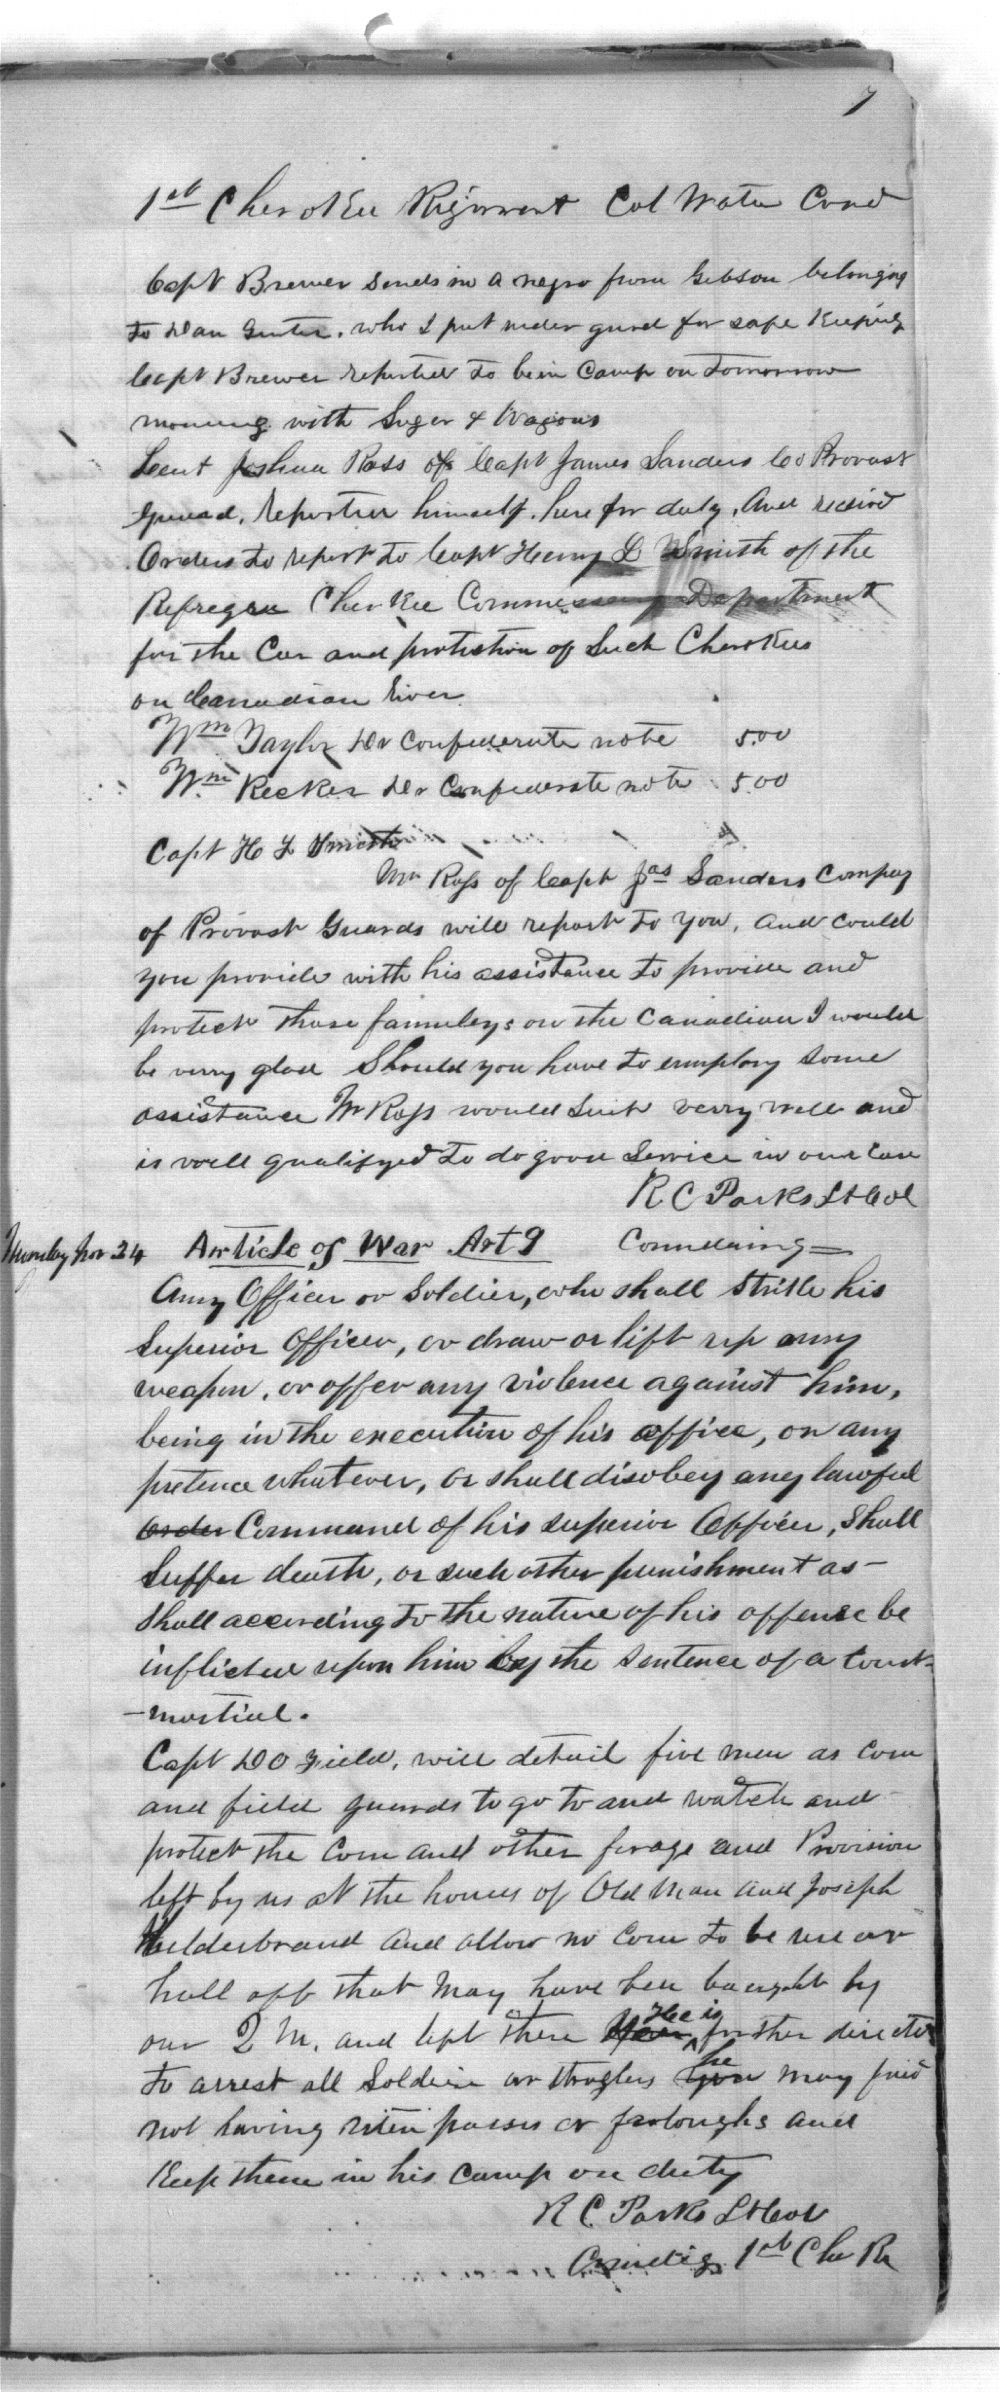 First Cherokee Regiment day book - 7